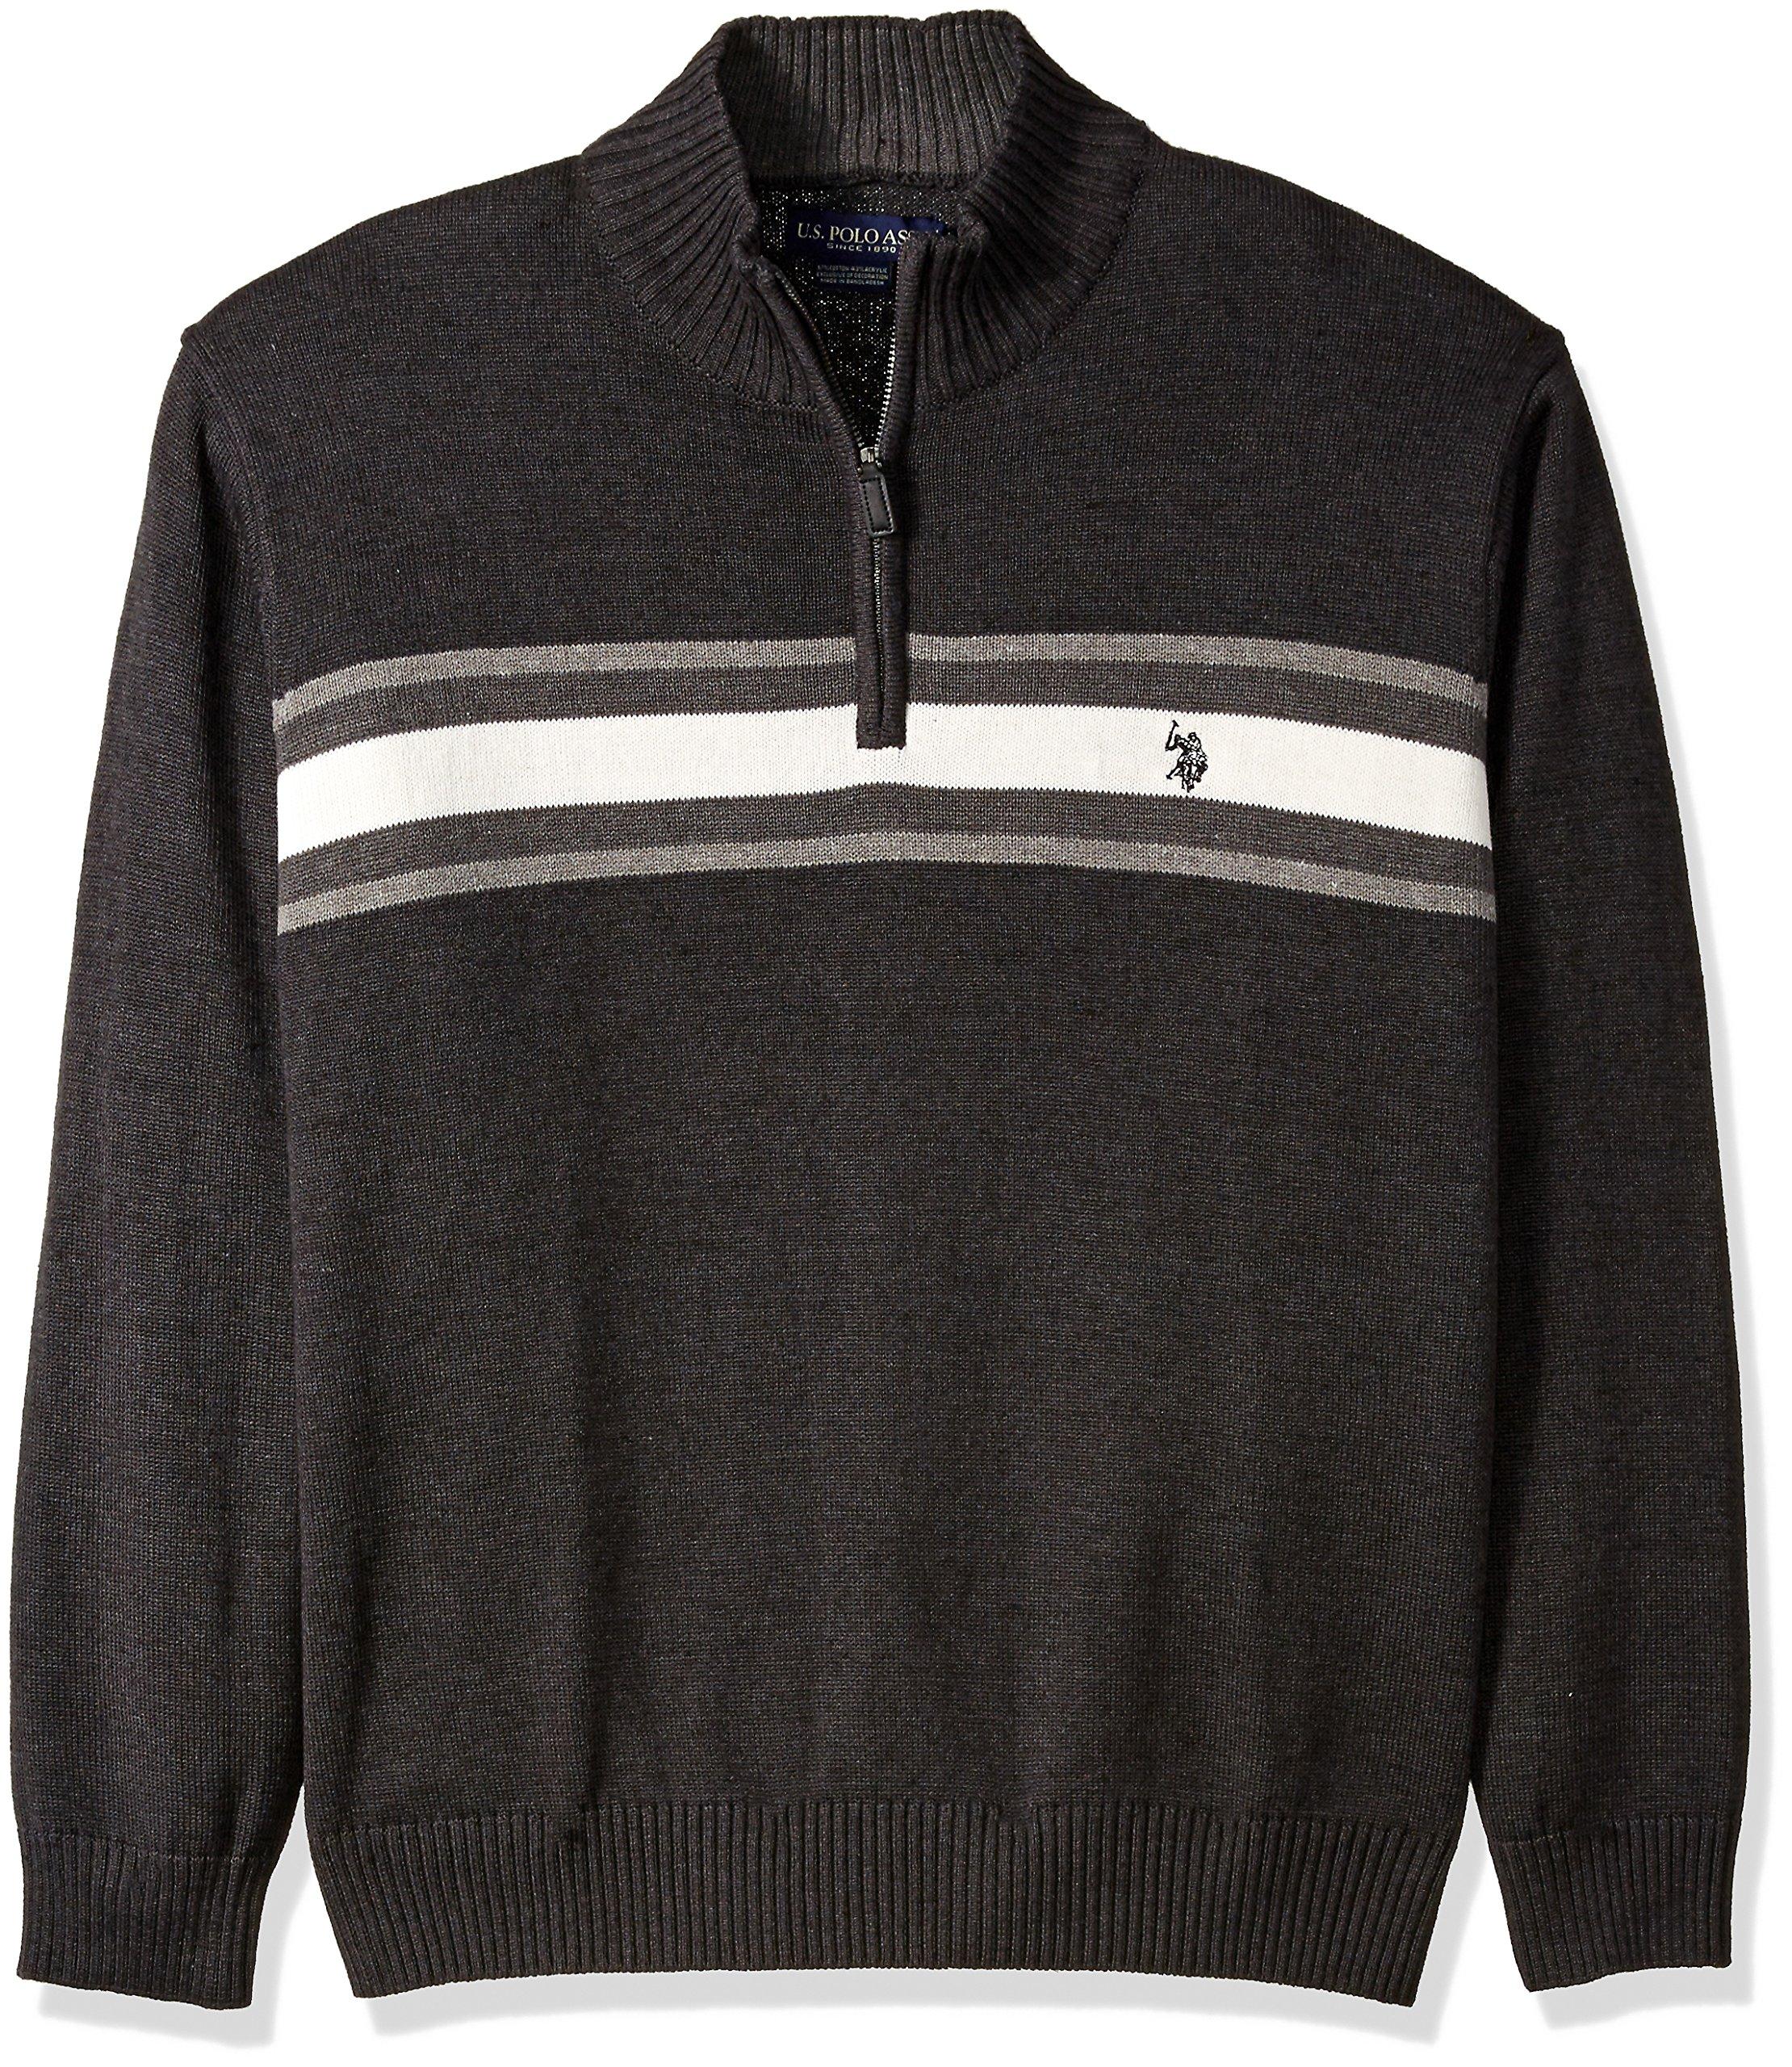 U.S. Polo Assn. Men's Tri-Color Chest Stripe 1/4 Zip Sweater, Charcoal Heather, X-Large